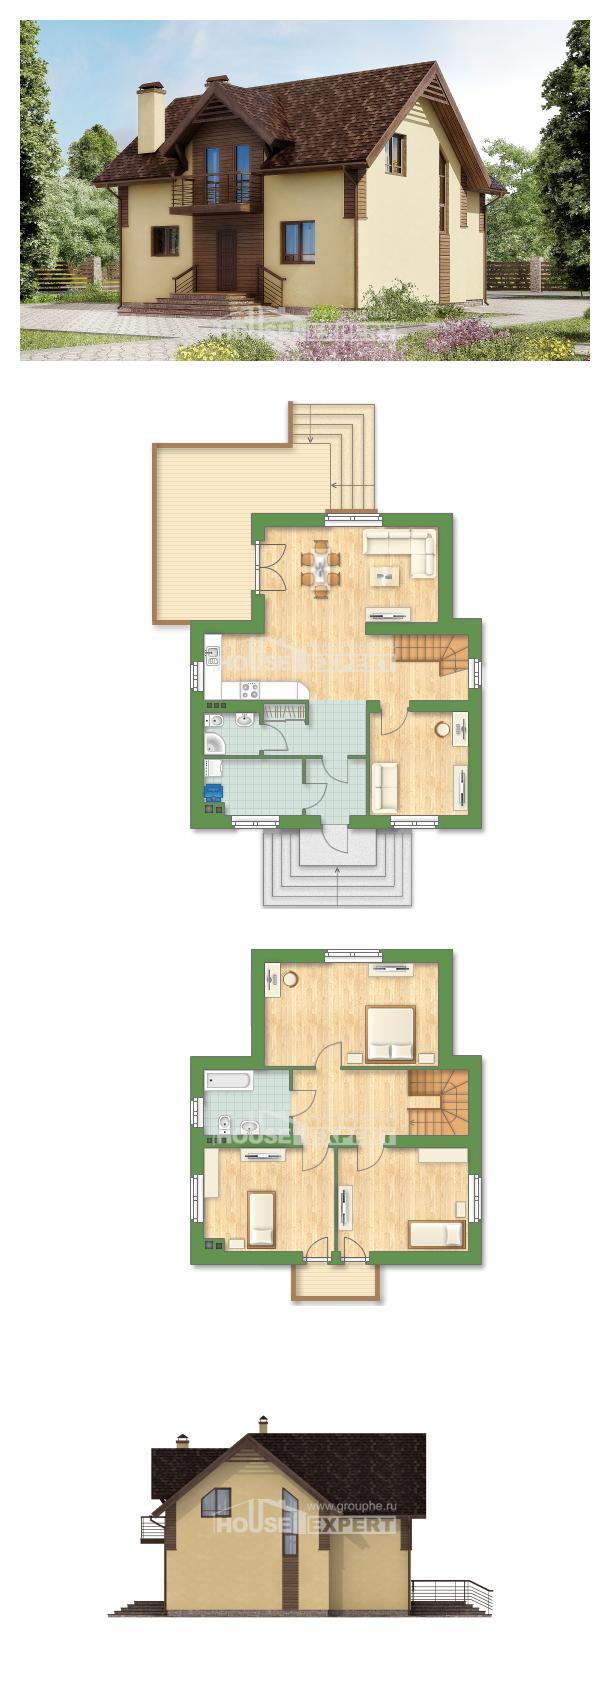 Проект дома 150-009-Л | House Expert